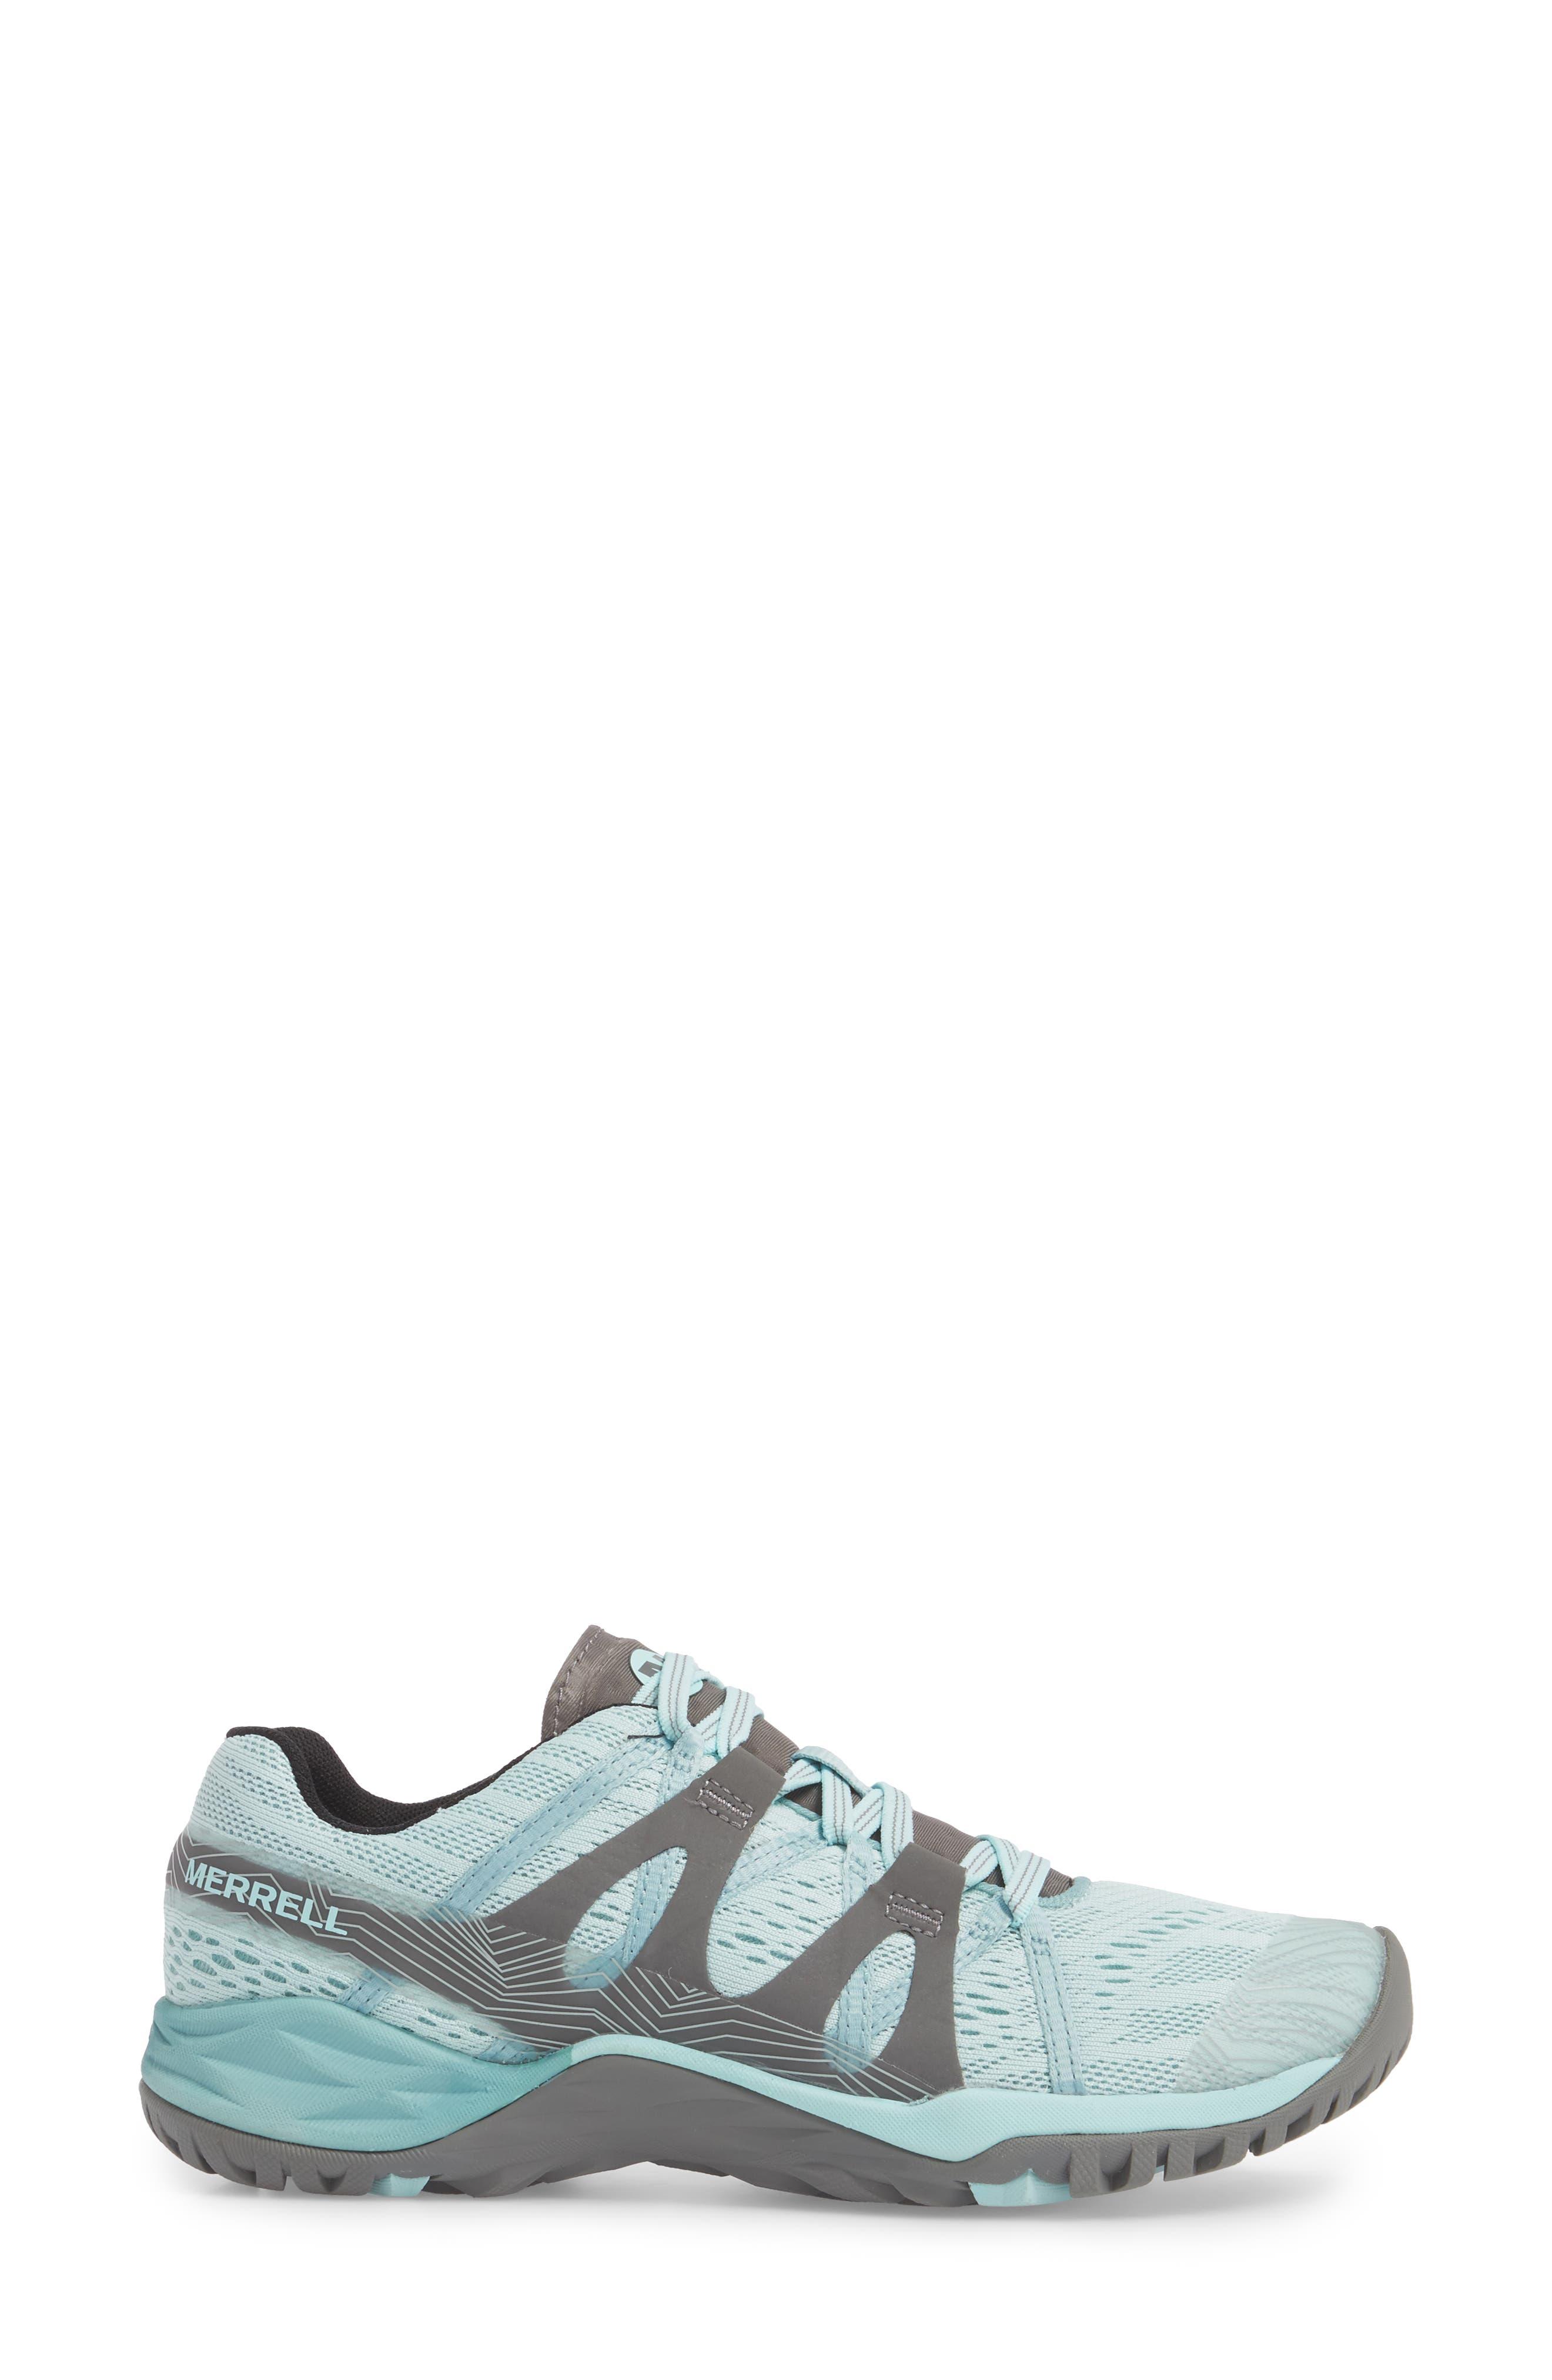 Siren Hex Sneaker,                             Alternate thumbnail 3, color,                             Bleached Aqua